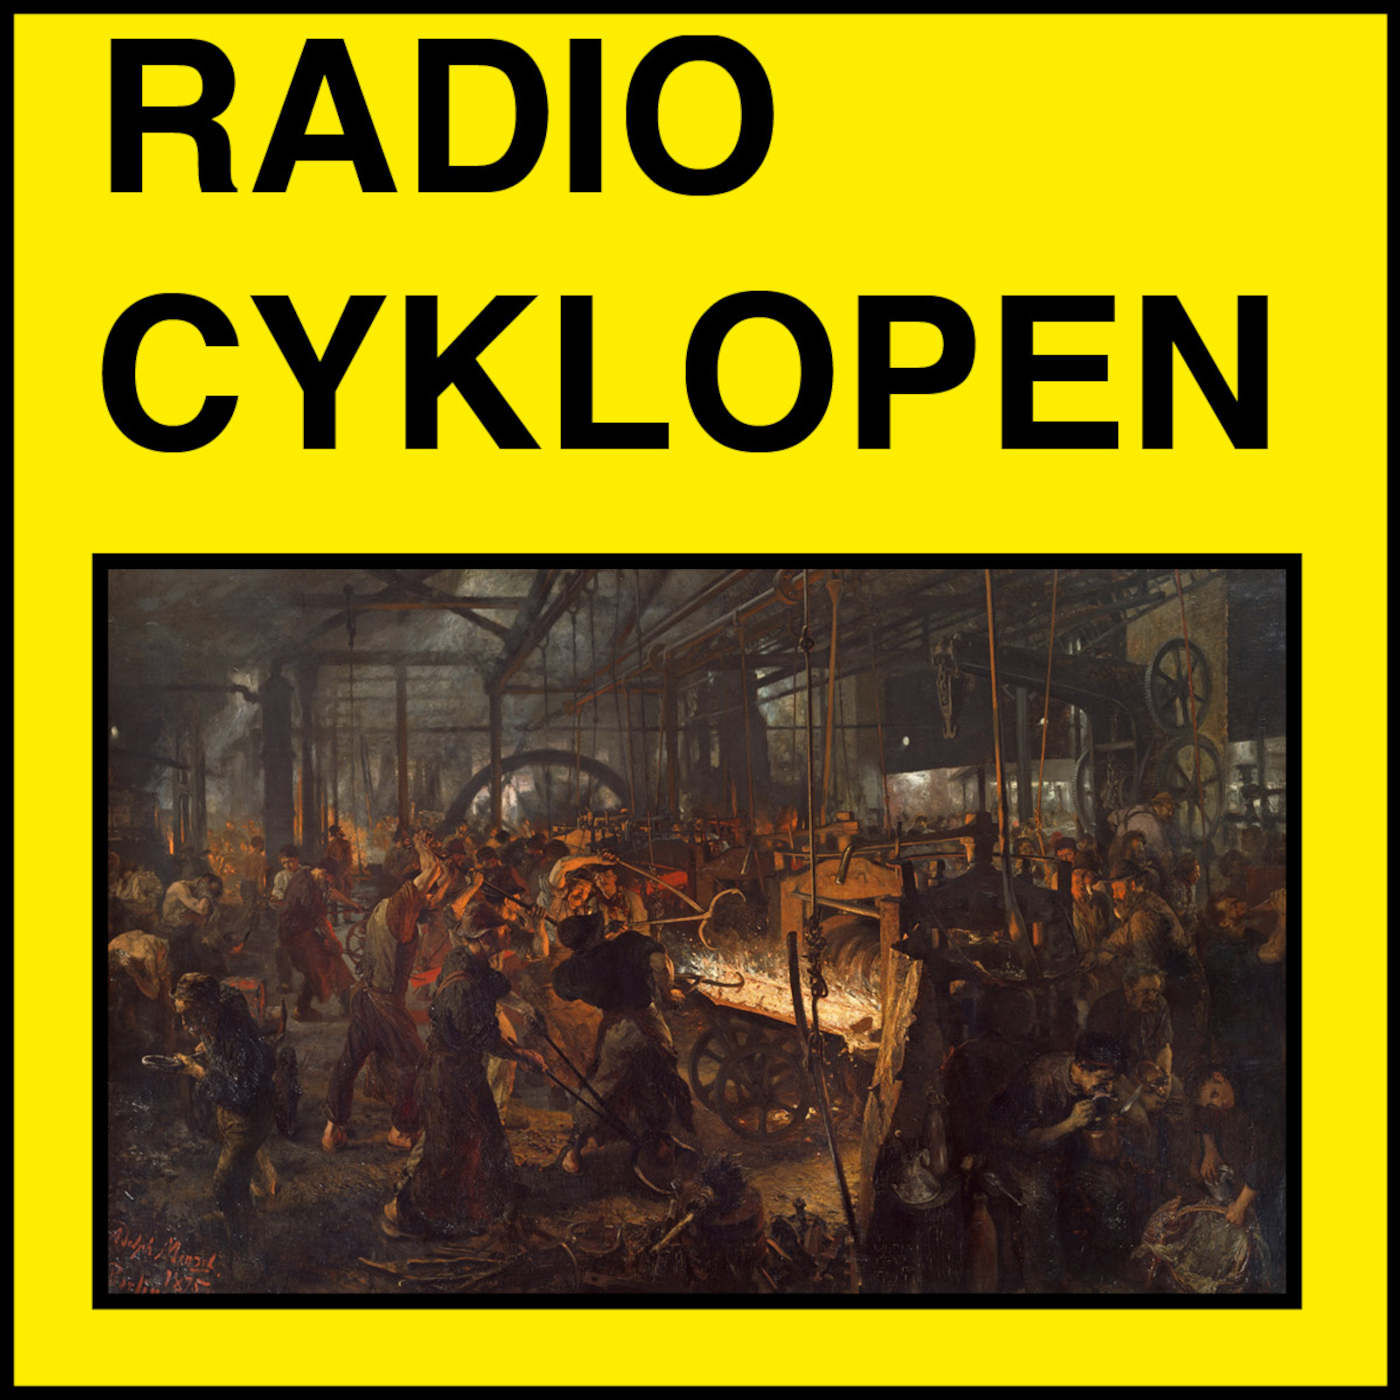 Radio Cyklopen #19: Releasefesten 2 fabriken